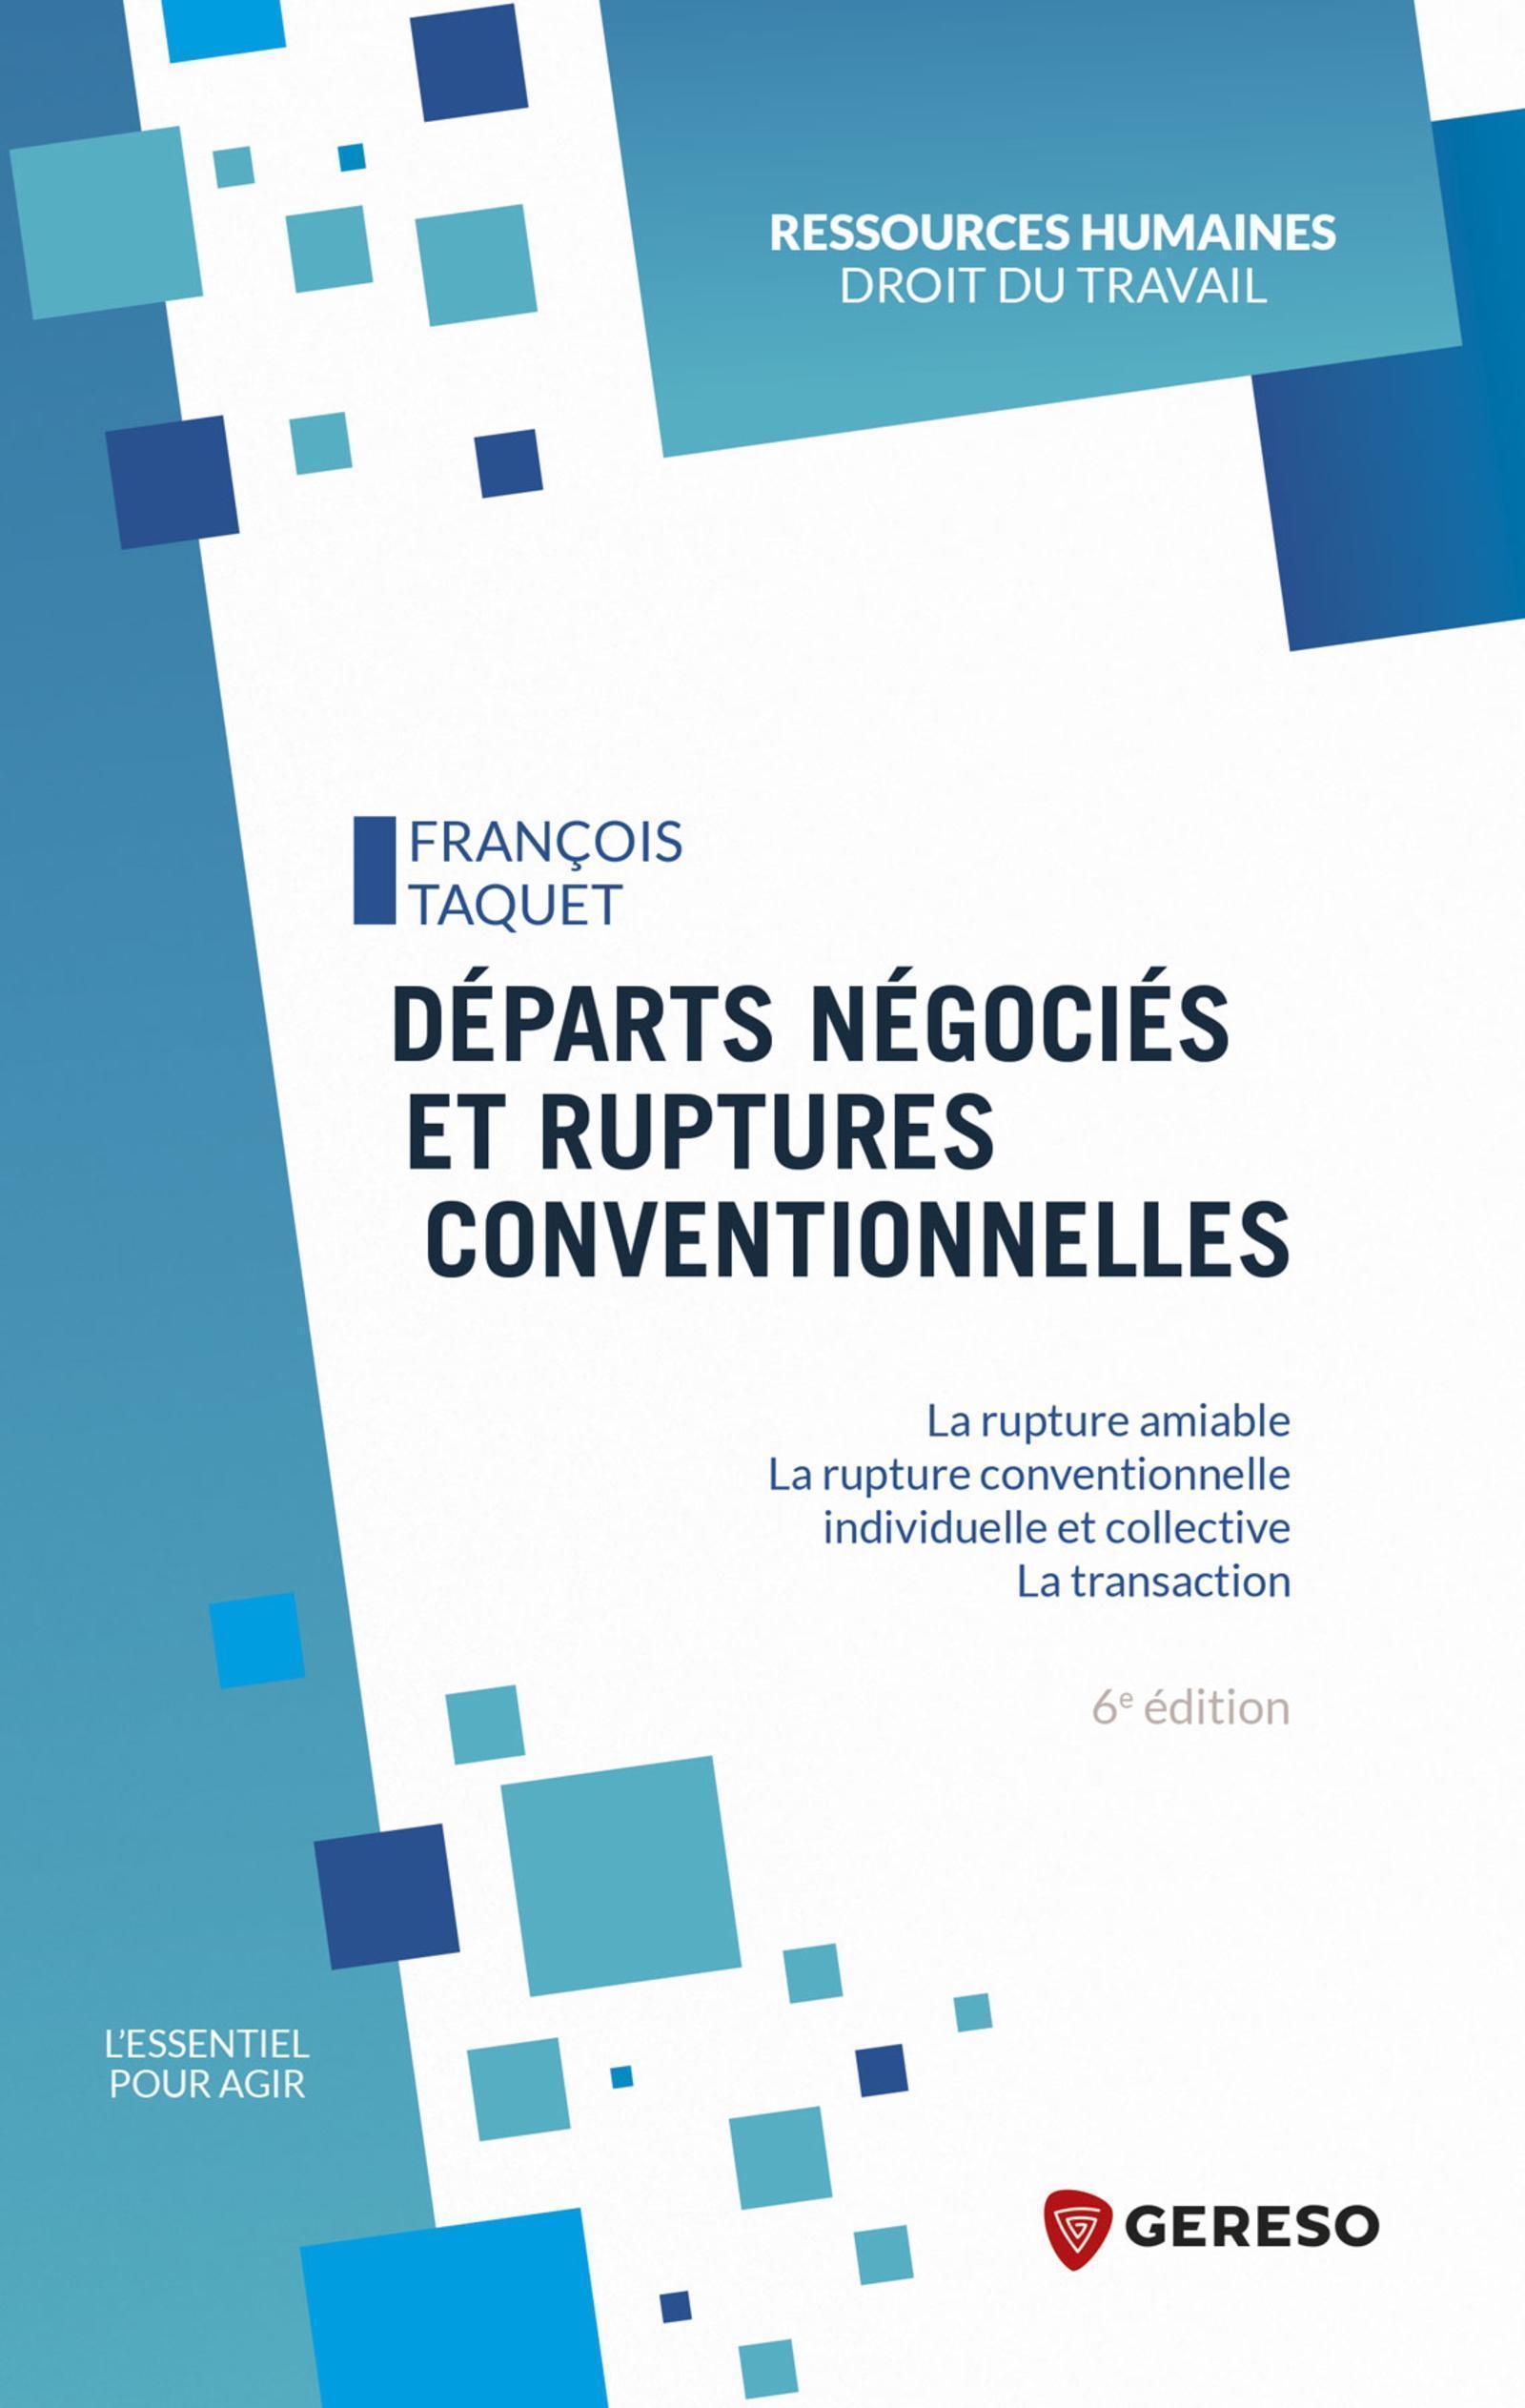 DEPARTS NEGOCIES ET RUPTURES CONVENTIONNELLES - LA RUPTURE AMIABLE. LA RUPTURE CONVENTIONNELLE INDIV